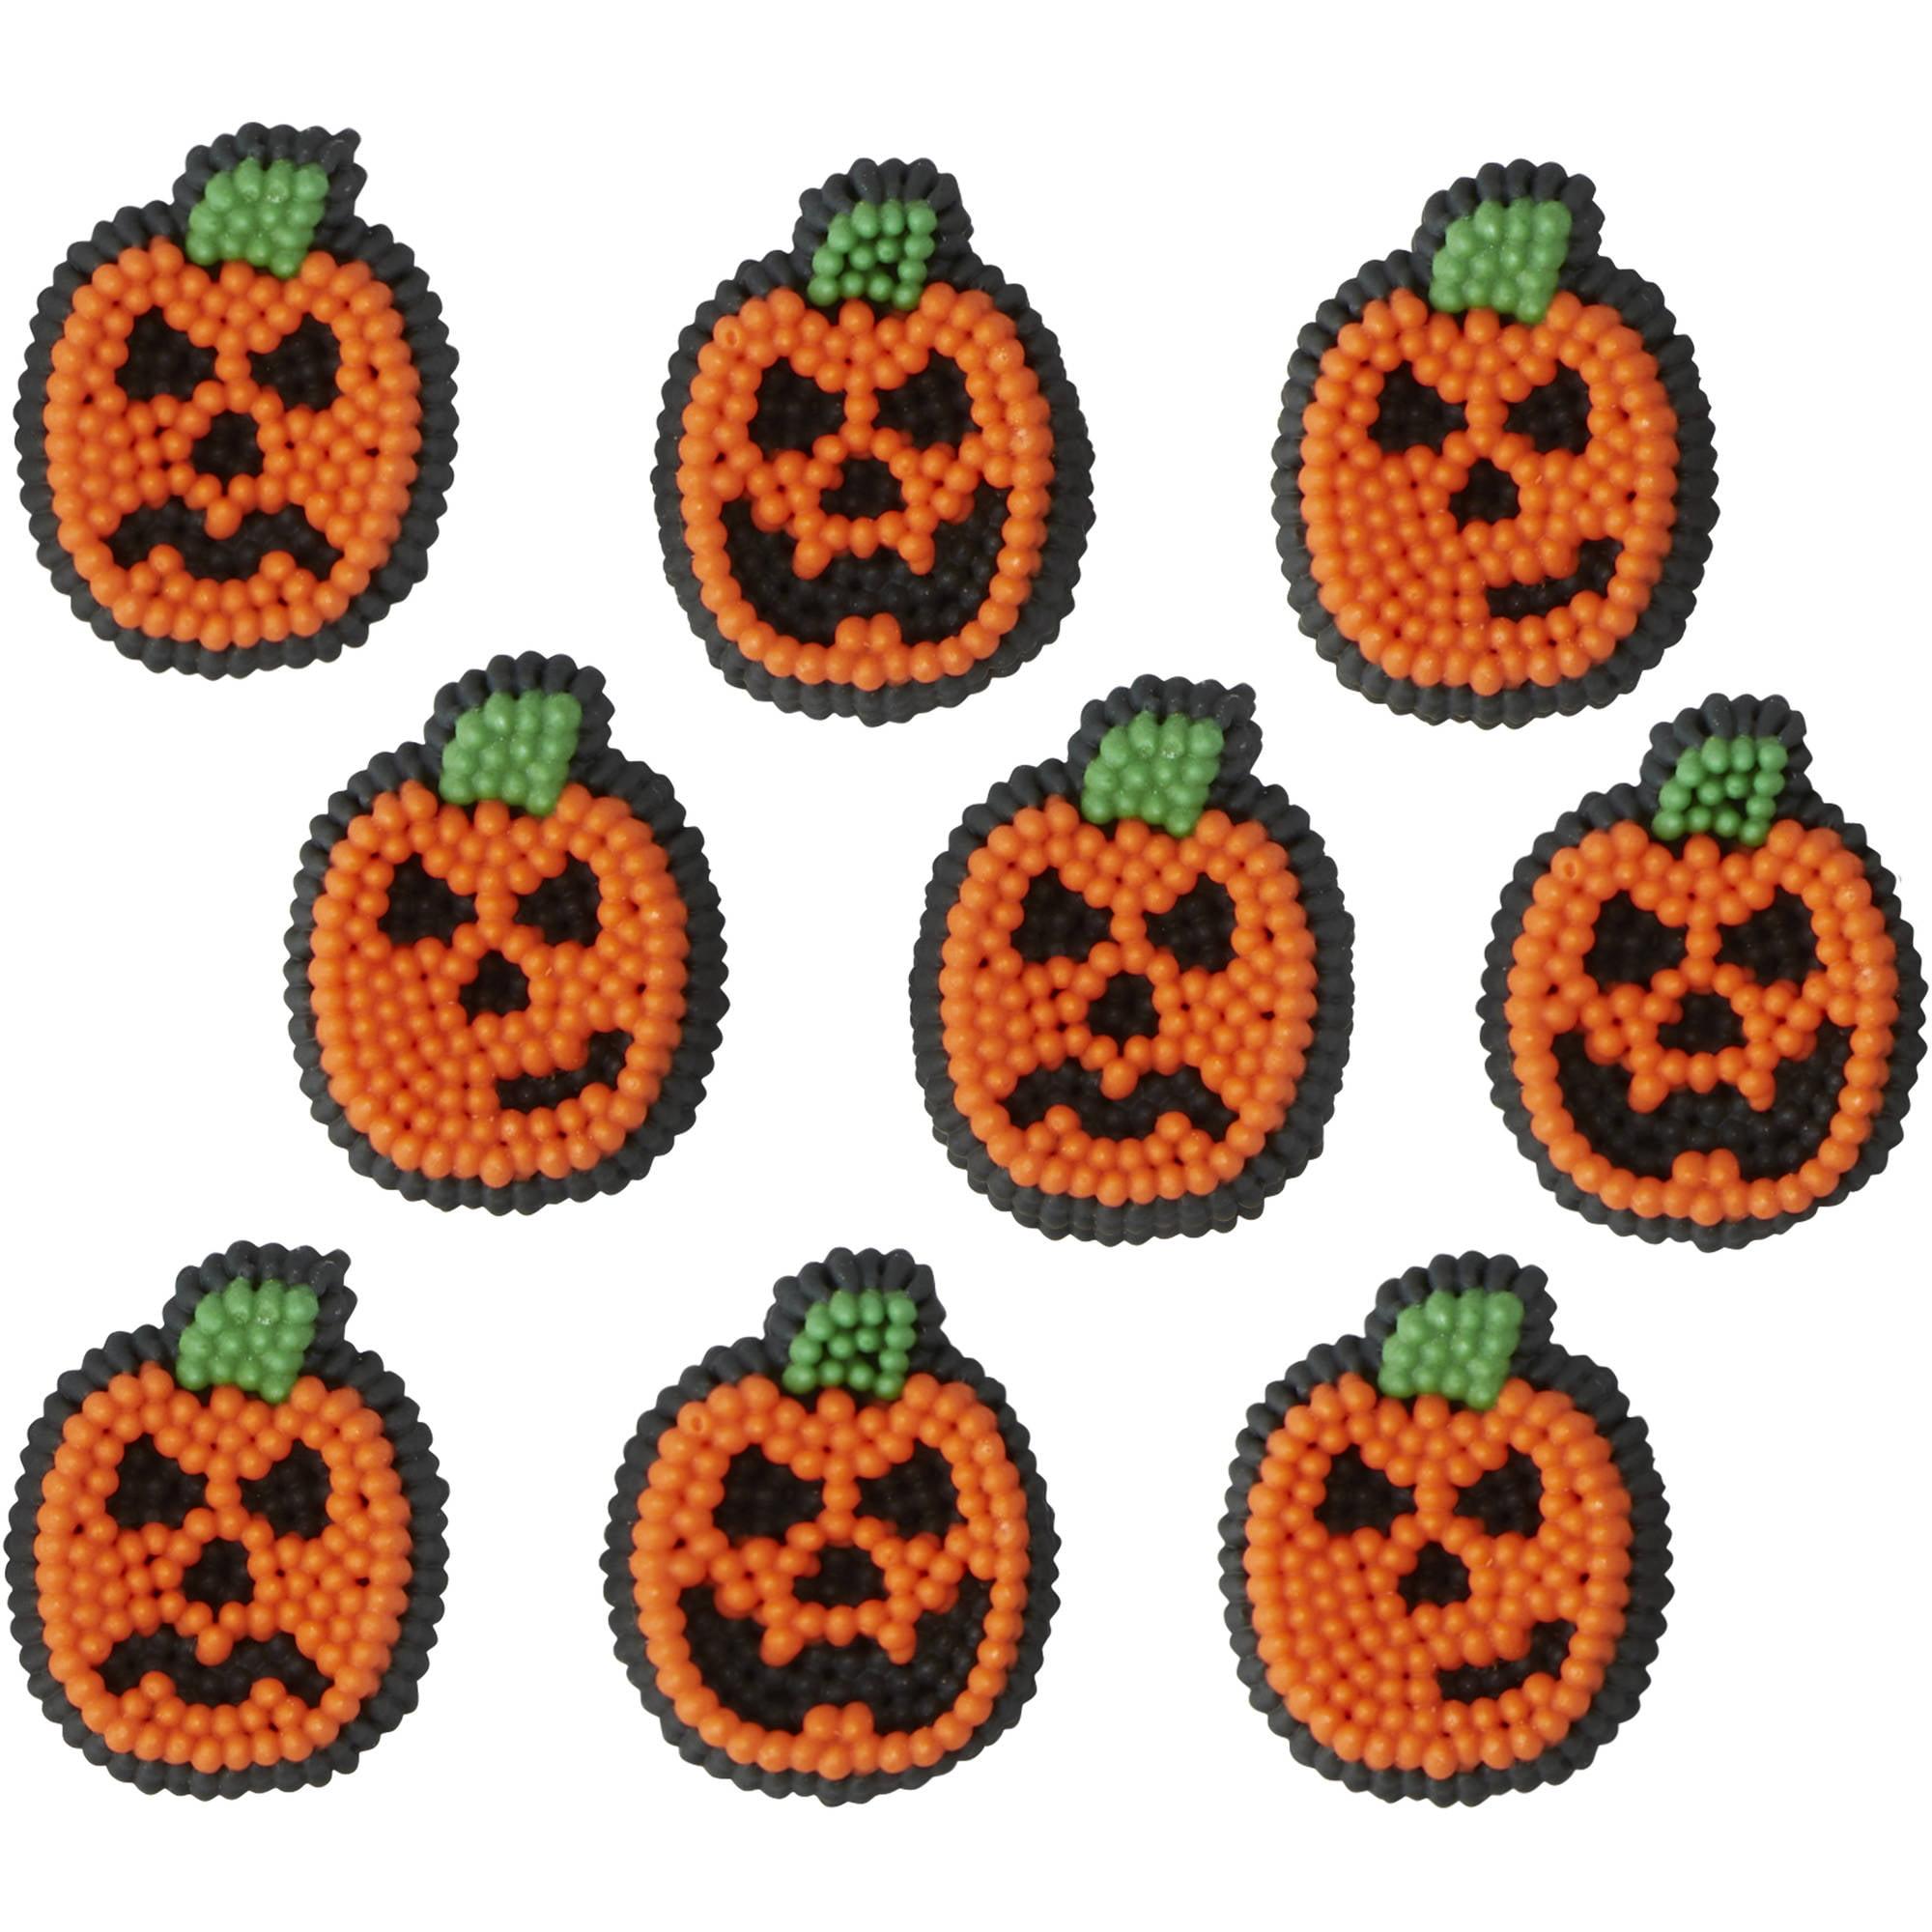 Wilton Halloween Pumpkin Icing Decorations, 710-6026